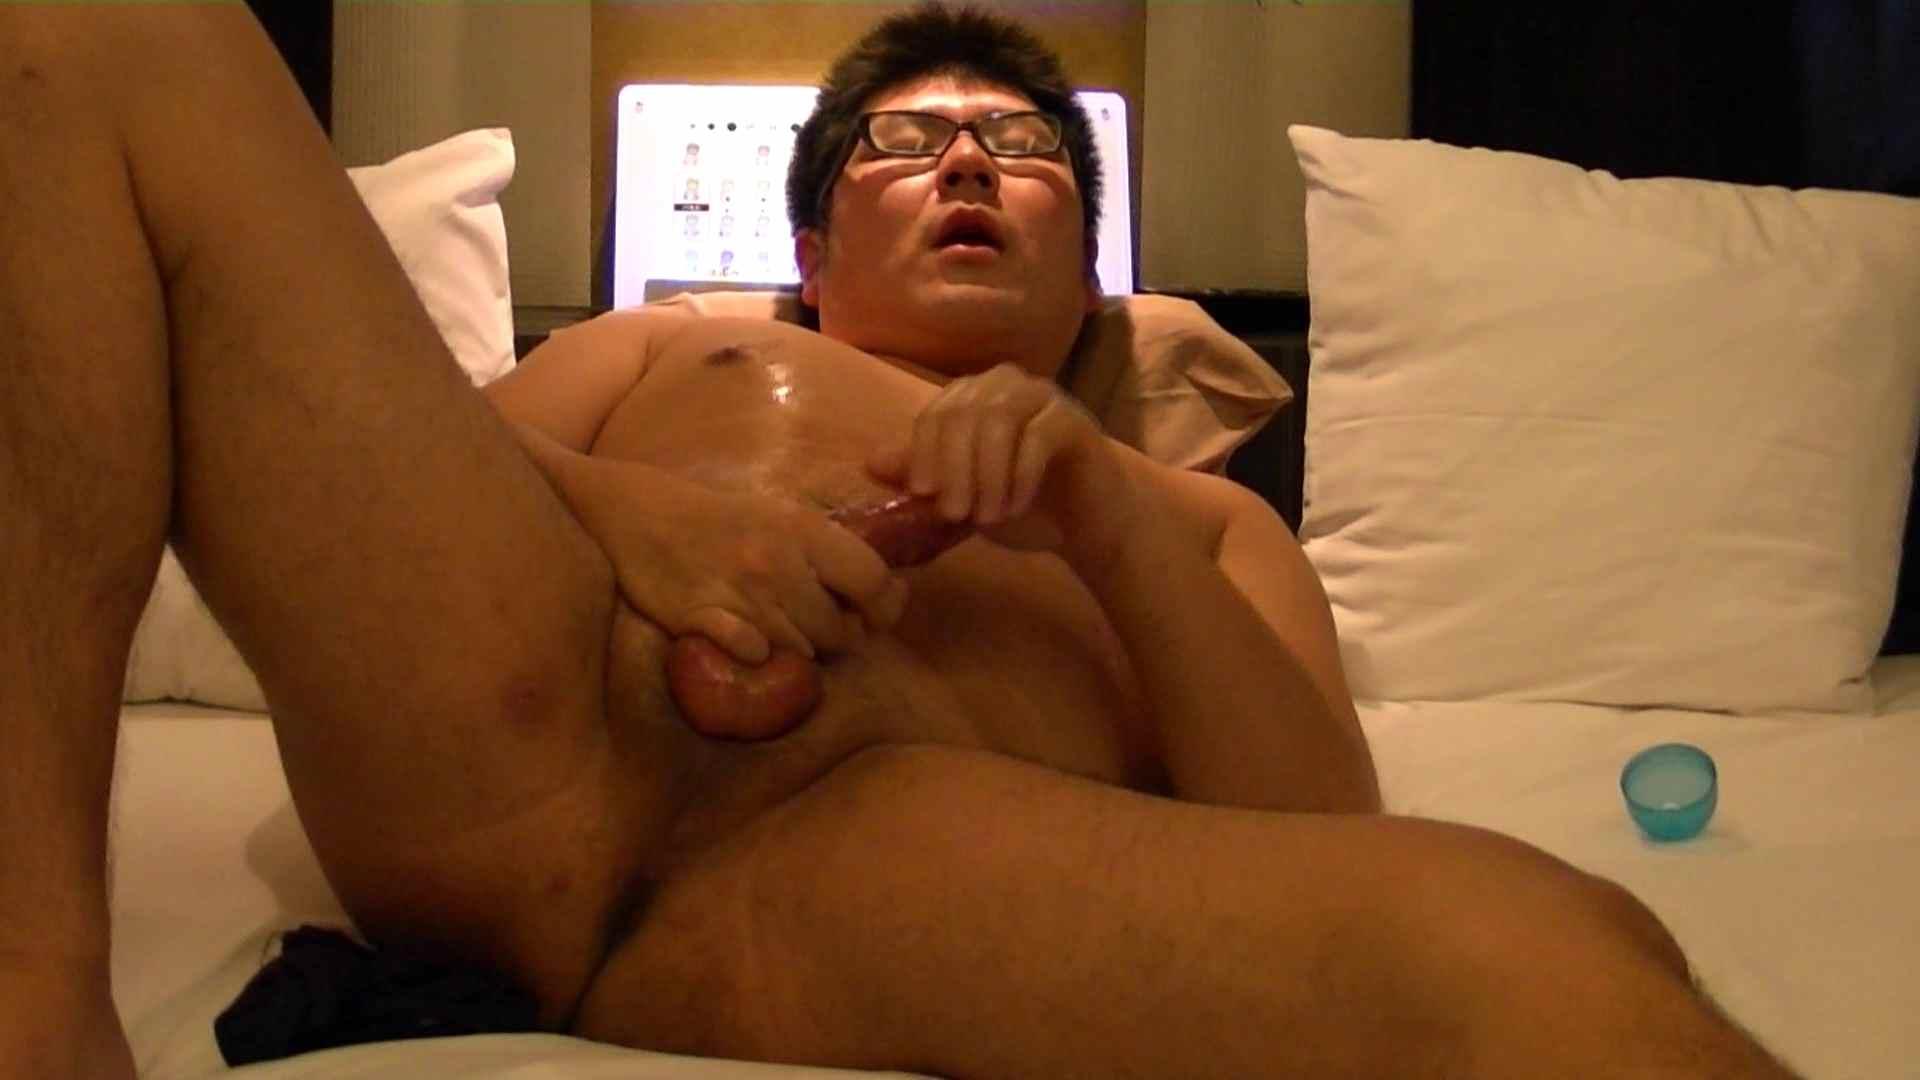 Mr.オナックスさん投稿!HD 貴方のオナニー三万円で撮影させてください。VOL.03 後編 完全無修正でお届け | オナニー特集  83pic 56